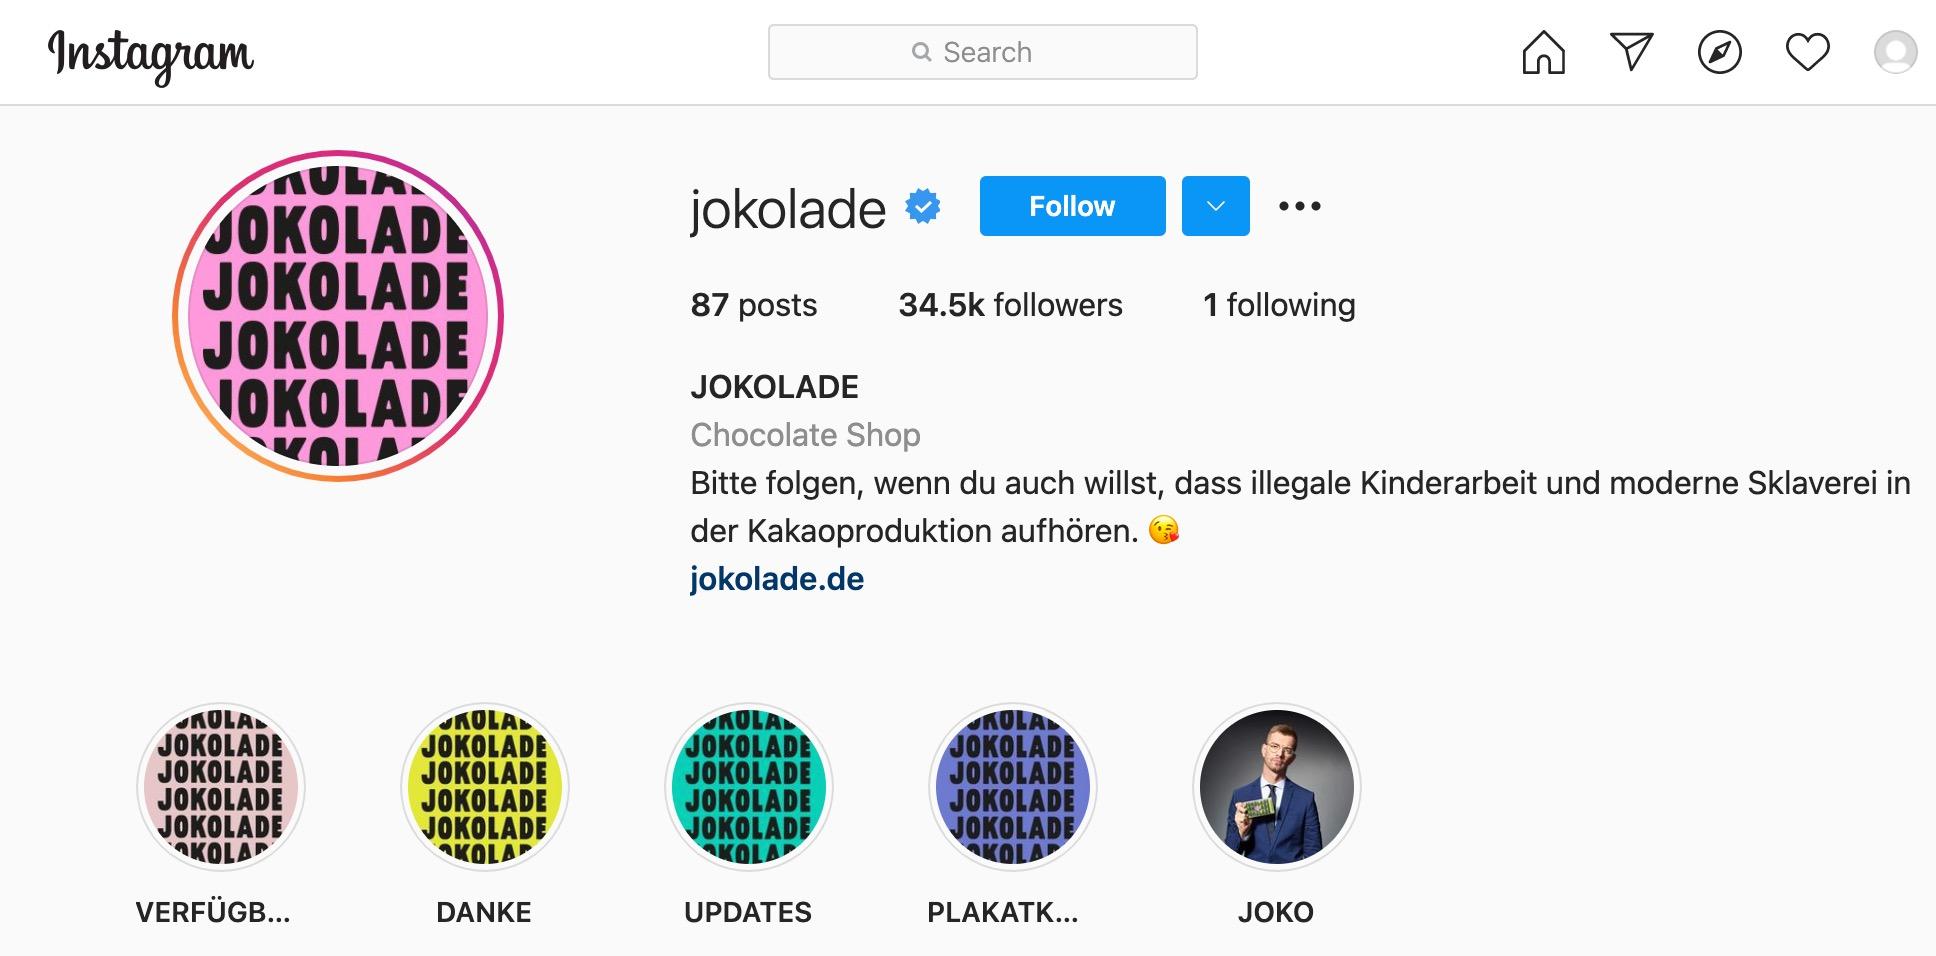 JOKOLADE Instagram Profil